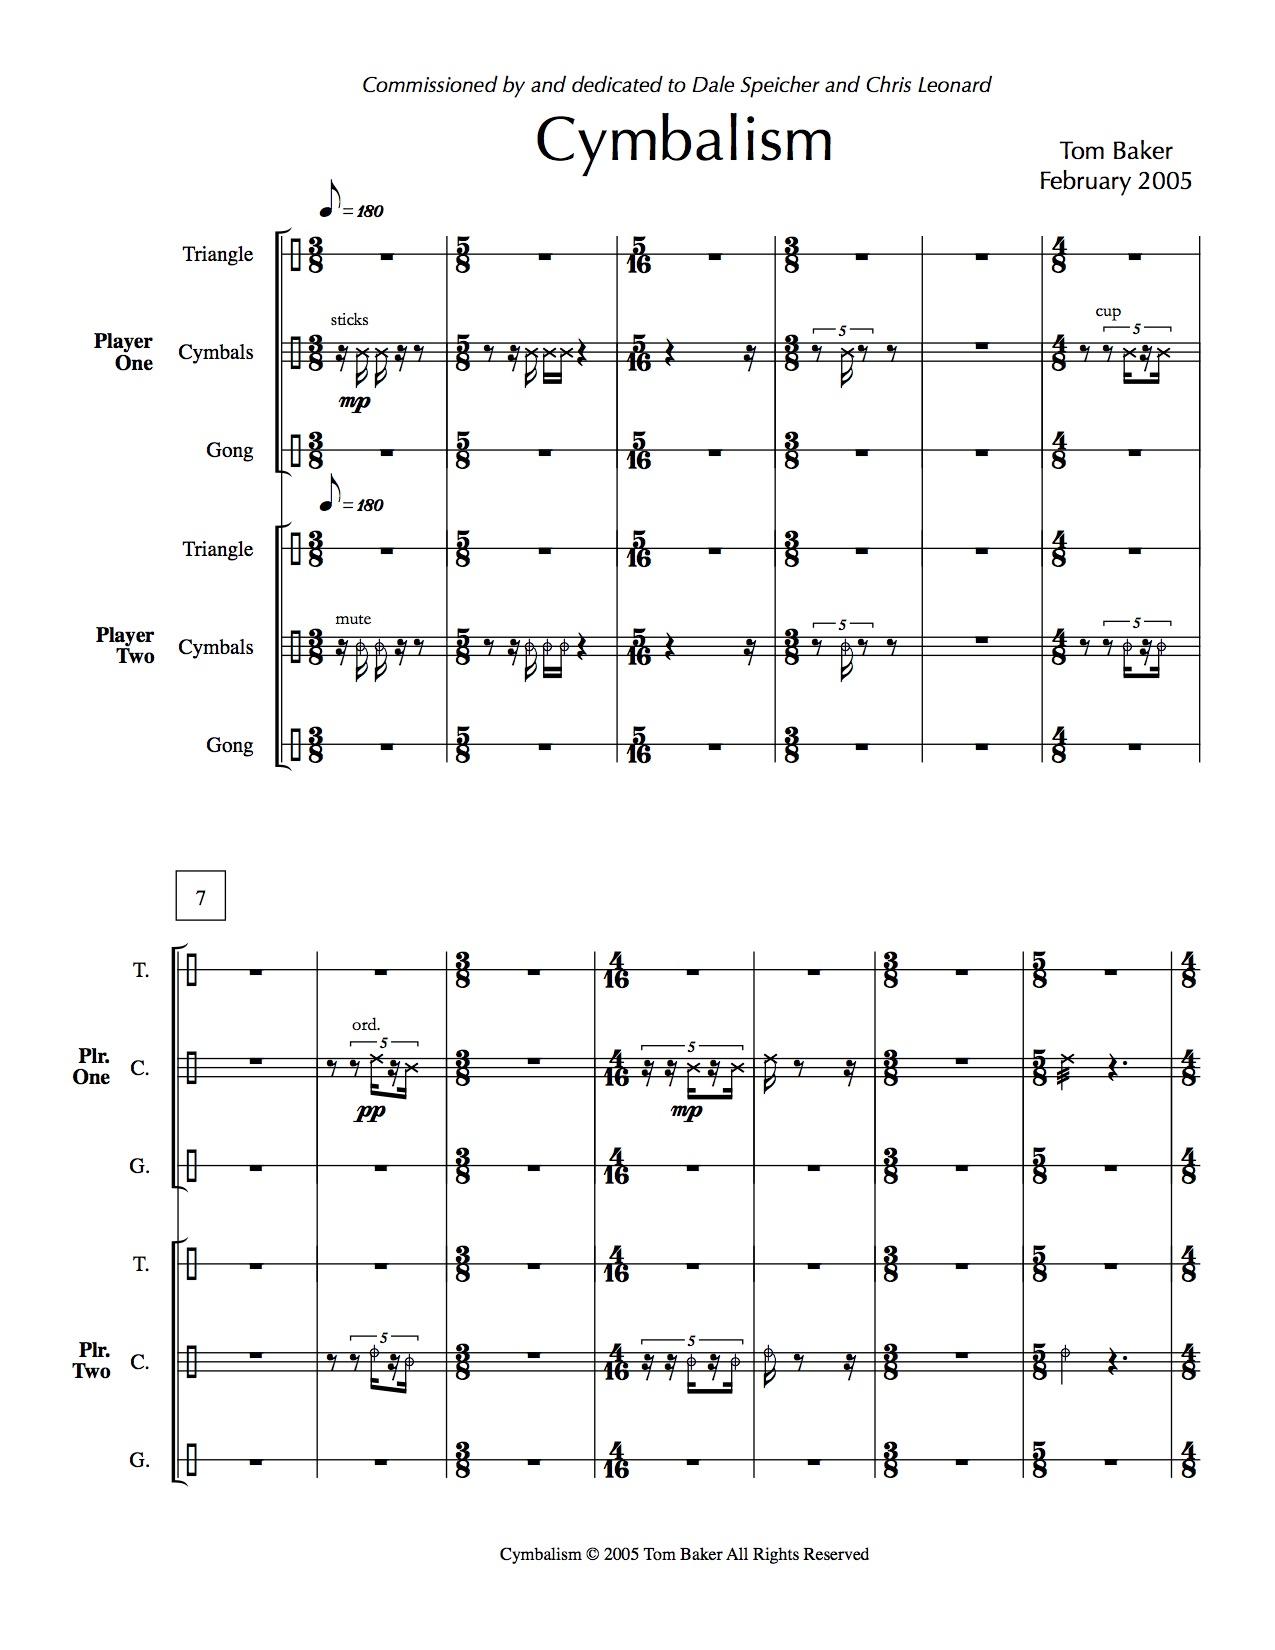 Cymbalism onepage.jpg